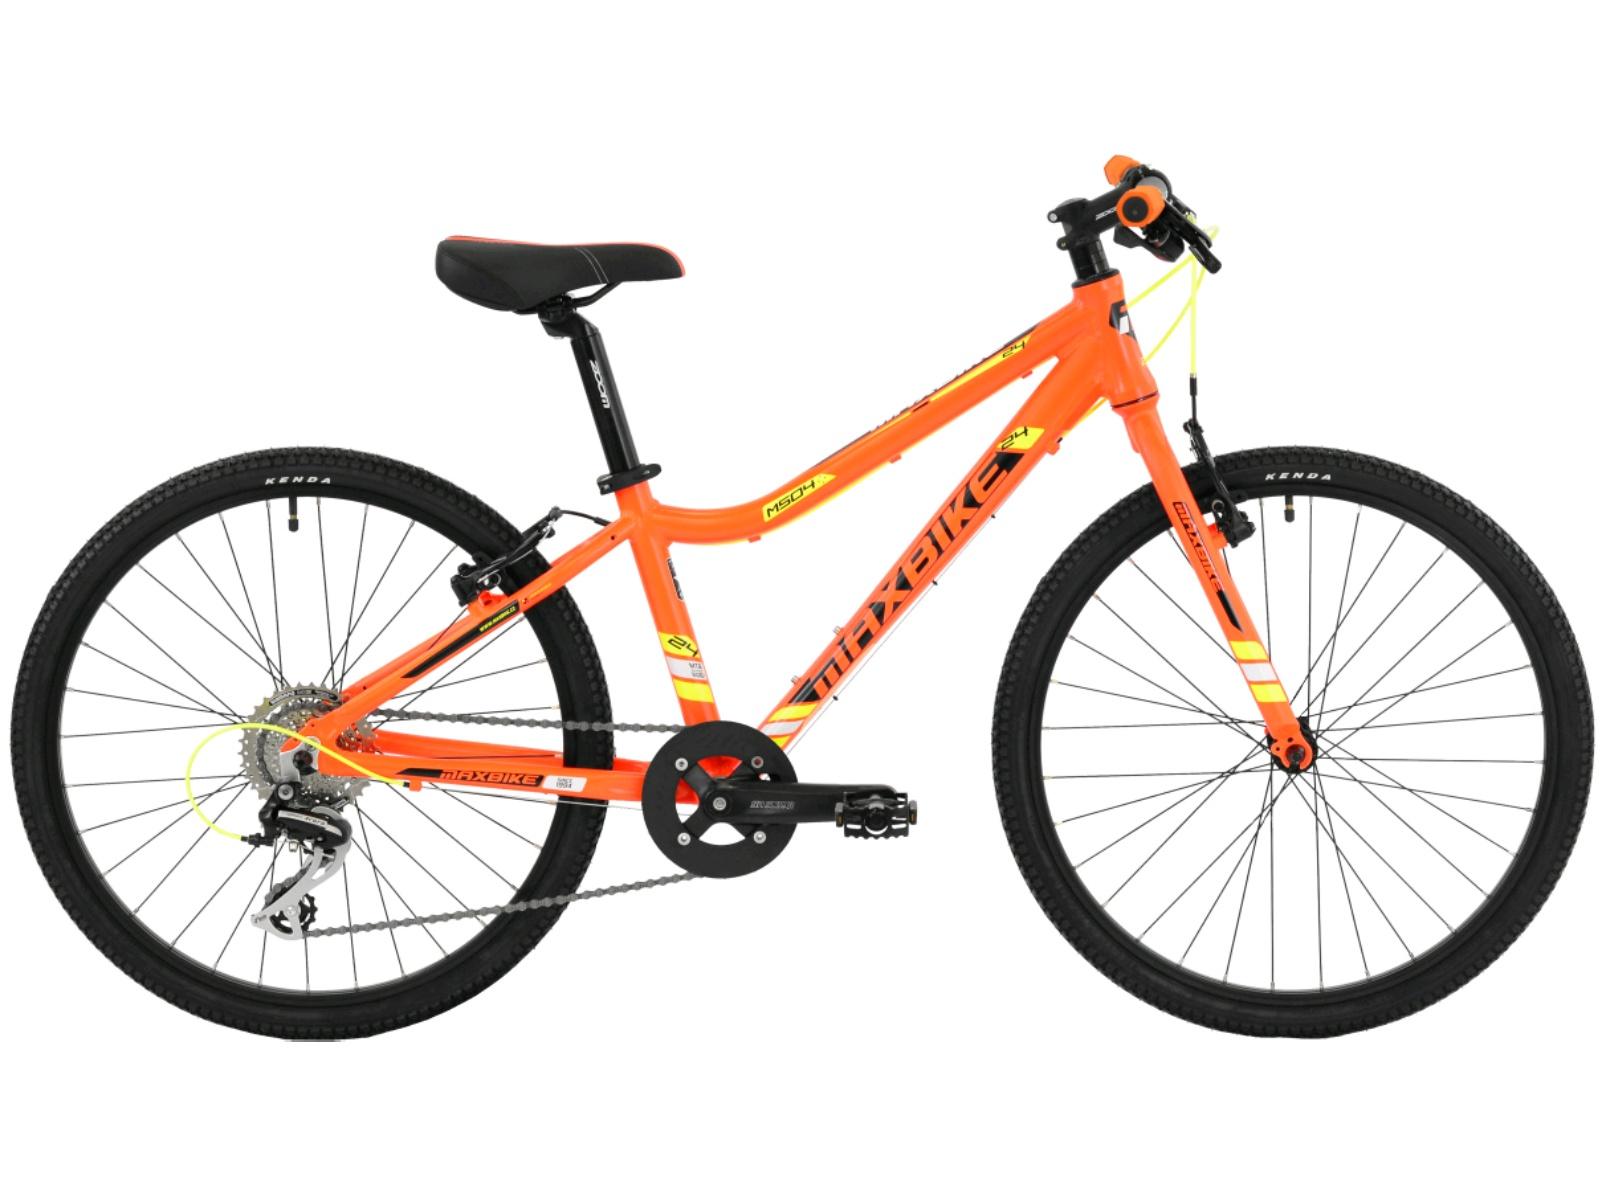 "Detský bicykel MAXBIKE Pirin 24"" - žlté"